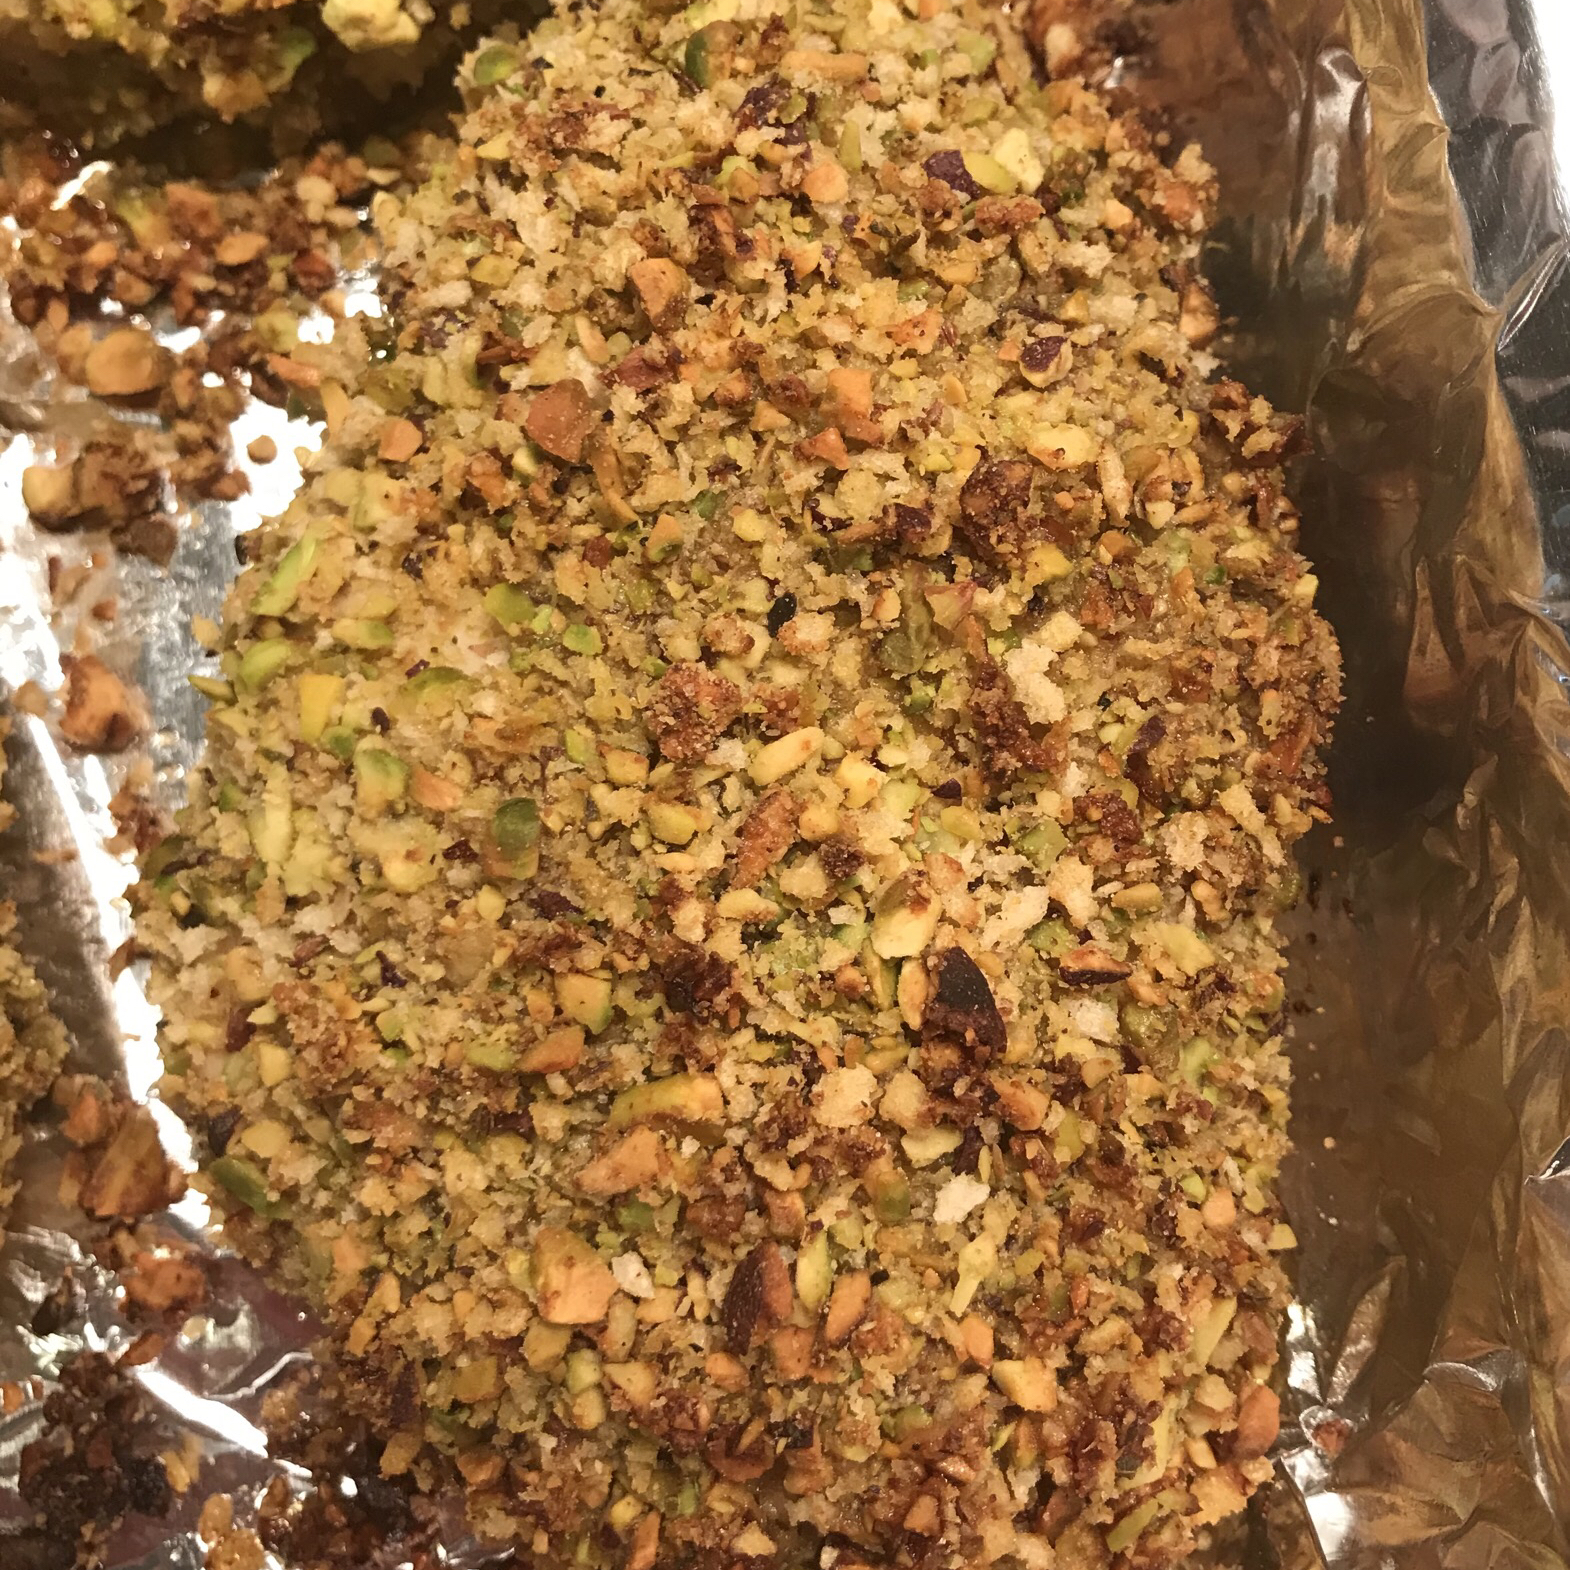 Pistachio Crusted Chicken Charisma138